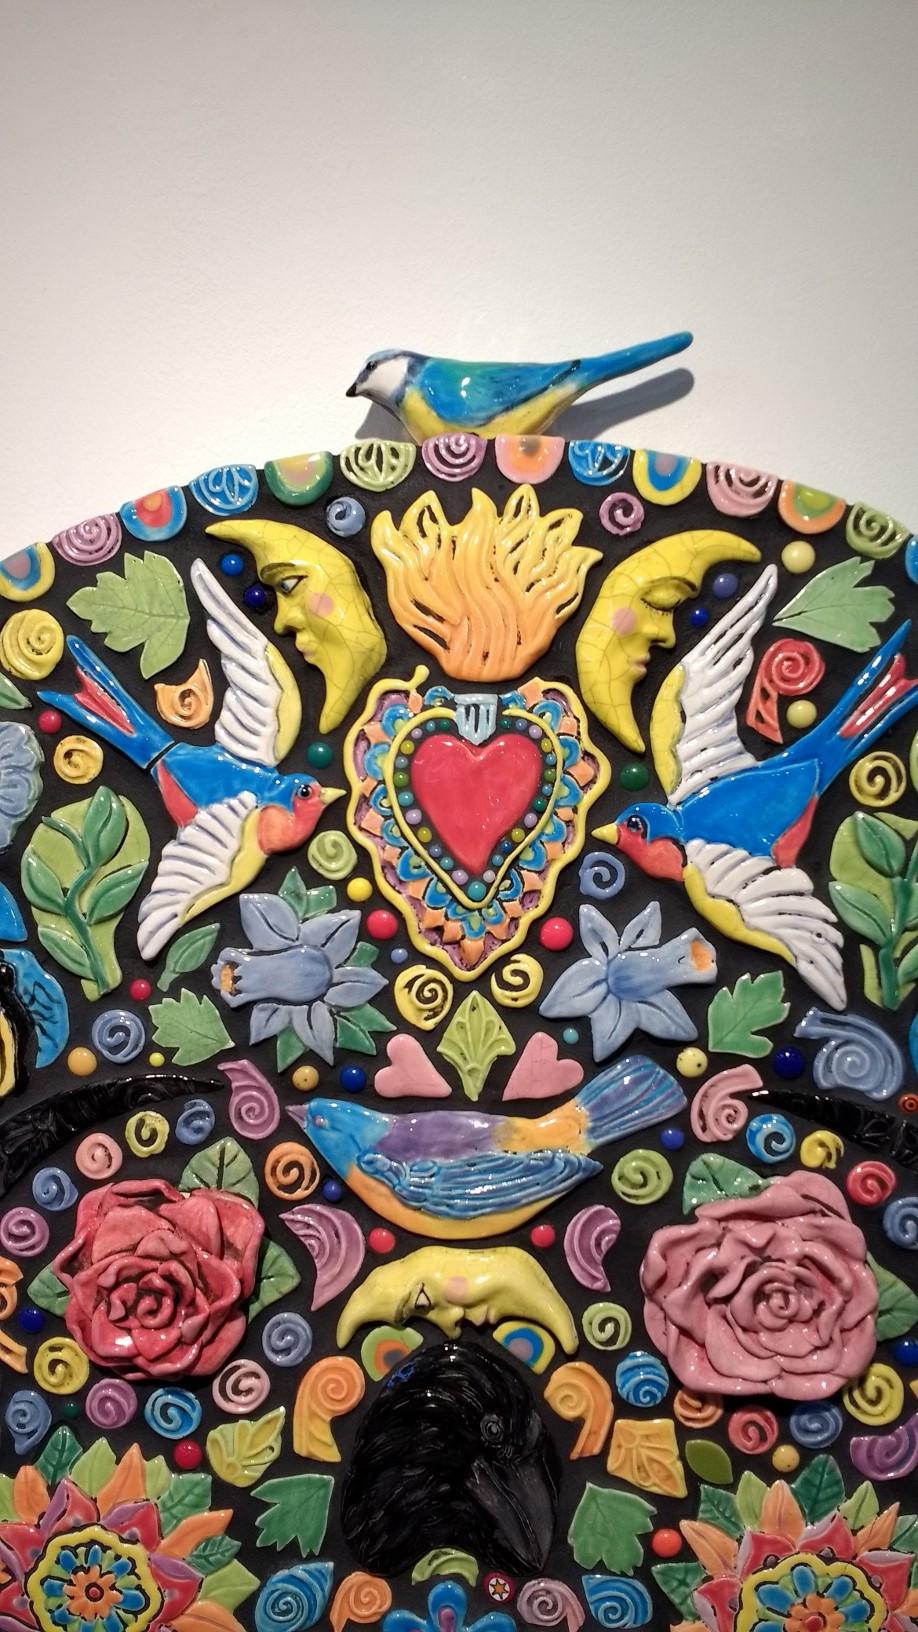 mosaic Michelle Greenwood-Brown